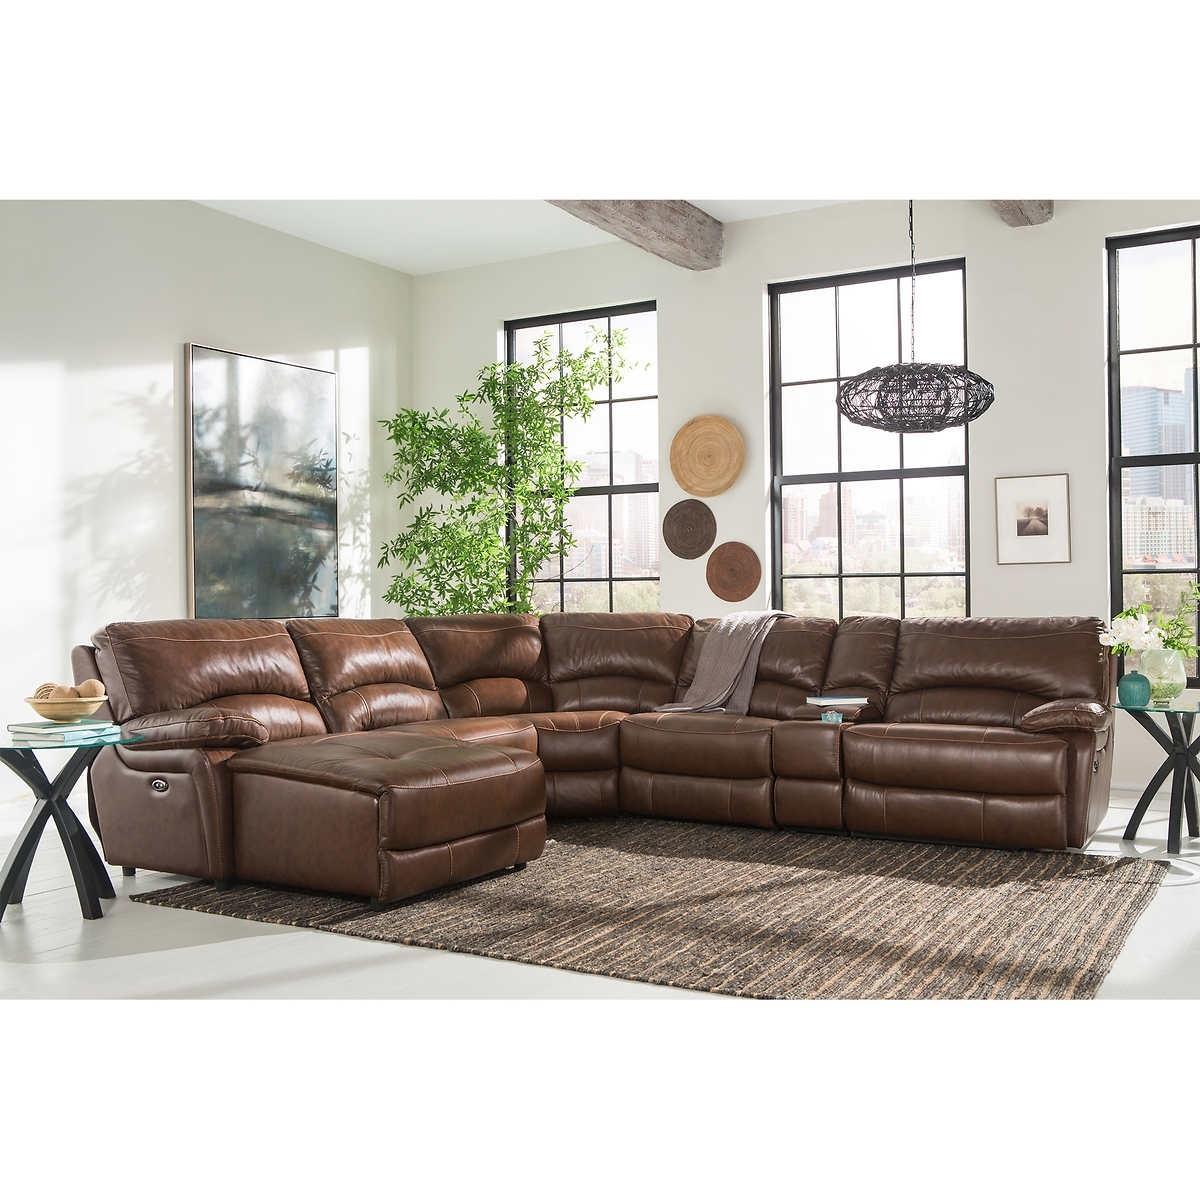 Recent 6 Piece Leather Sectional Sofas Regarding 6 Piece Leather Sectional Sofa – Radiovannes (View 3 of 15)